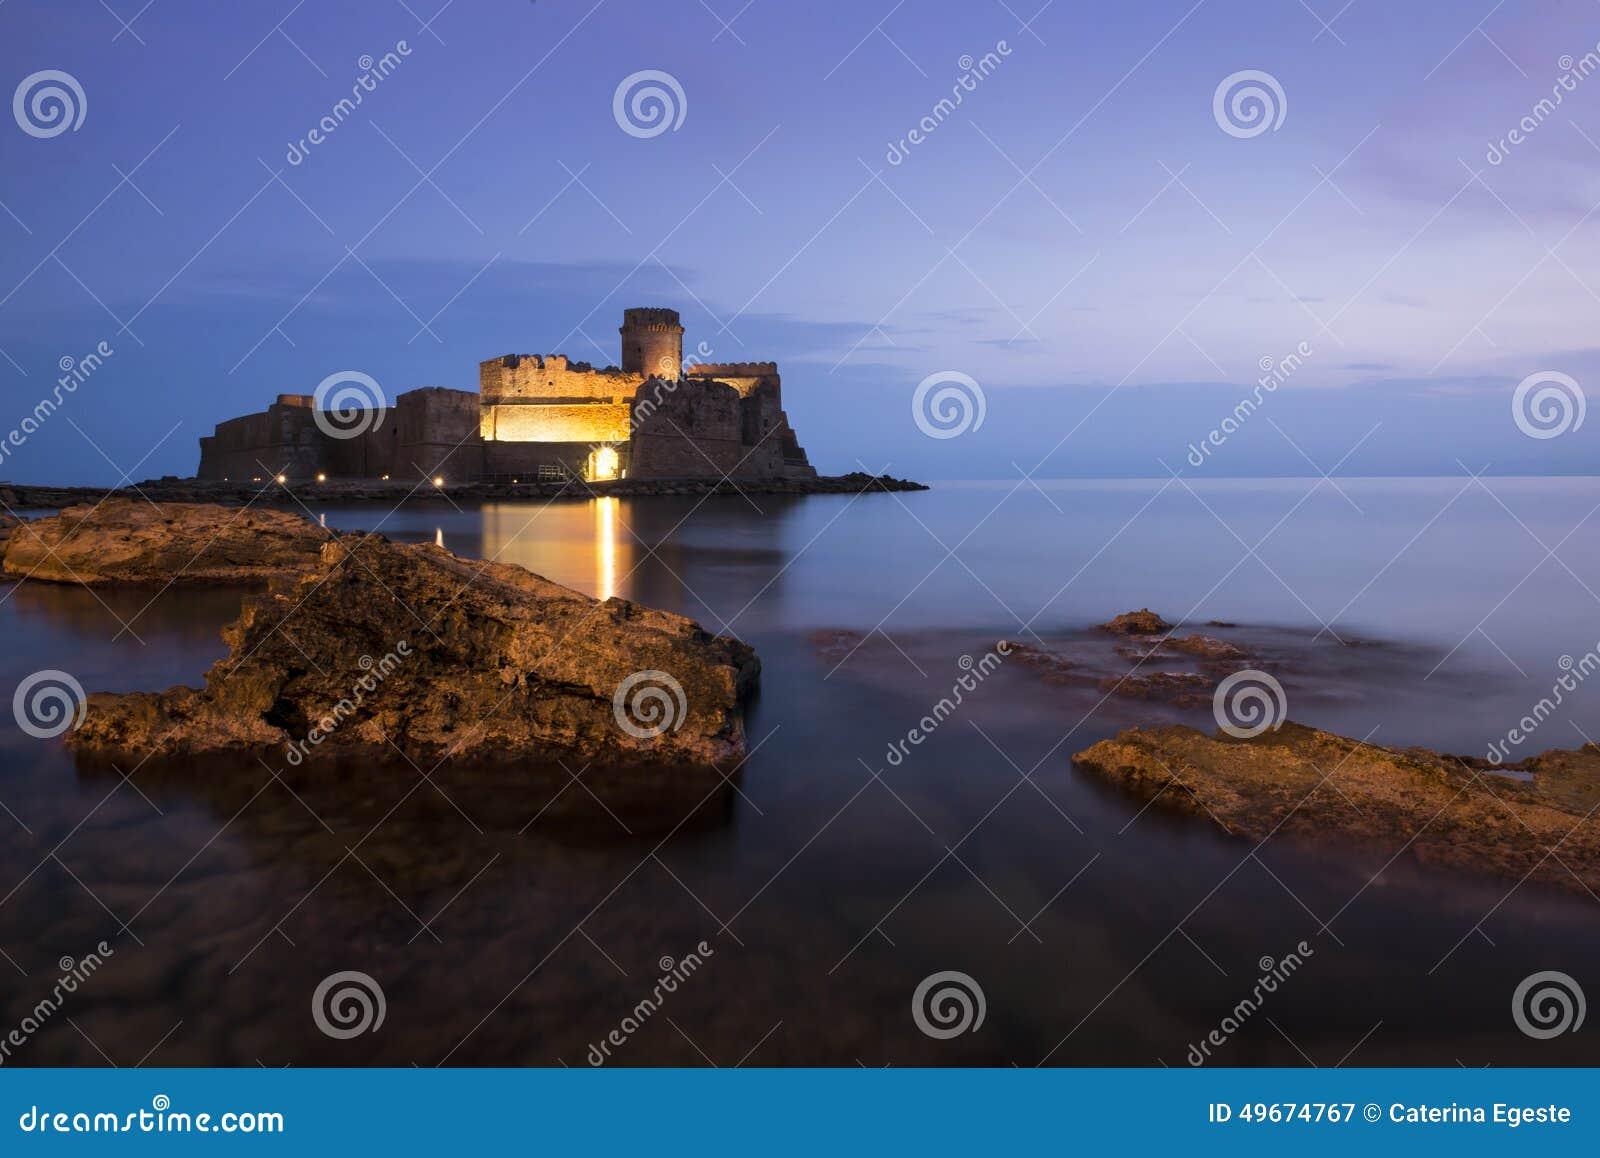 Rockera i havet i den Le Castella staden, Calabria, Italien